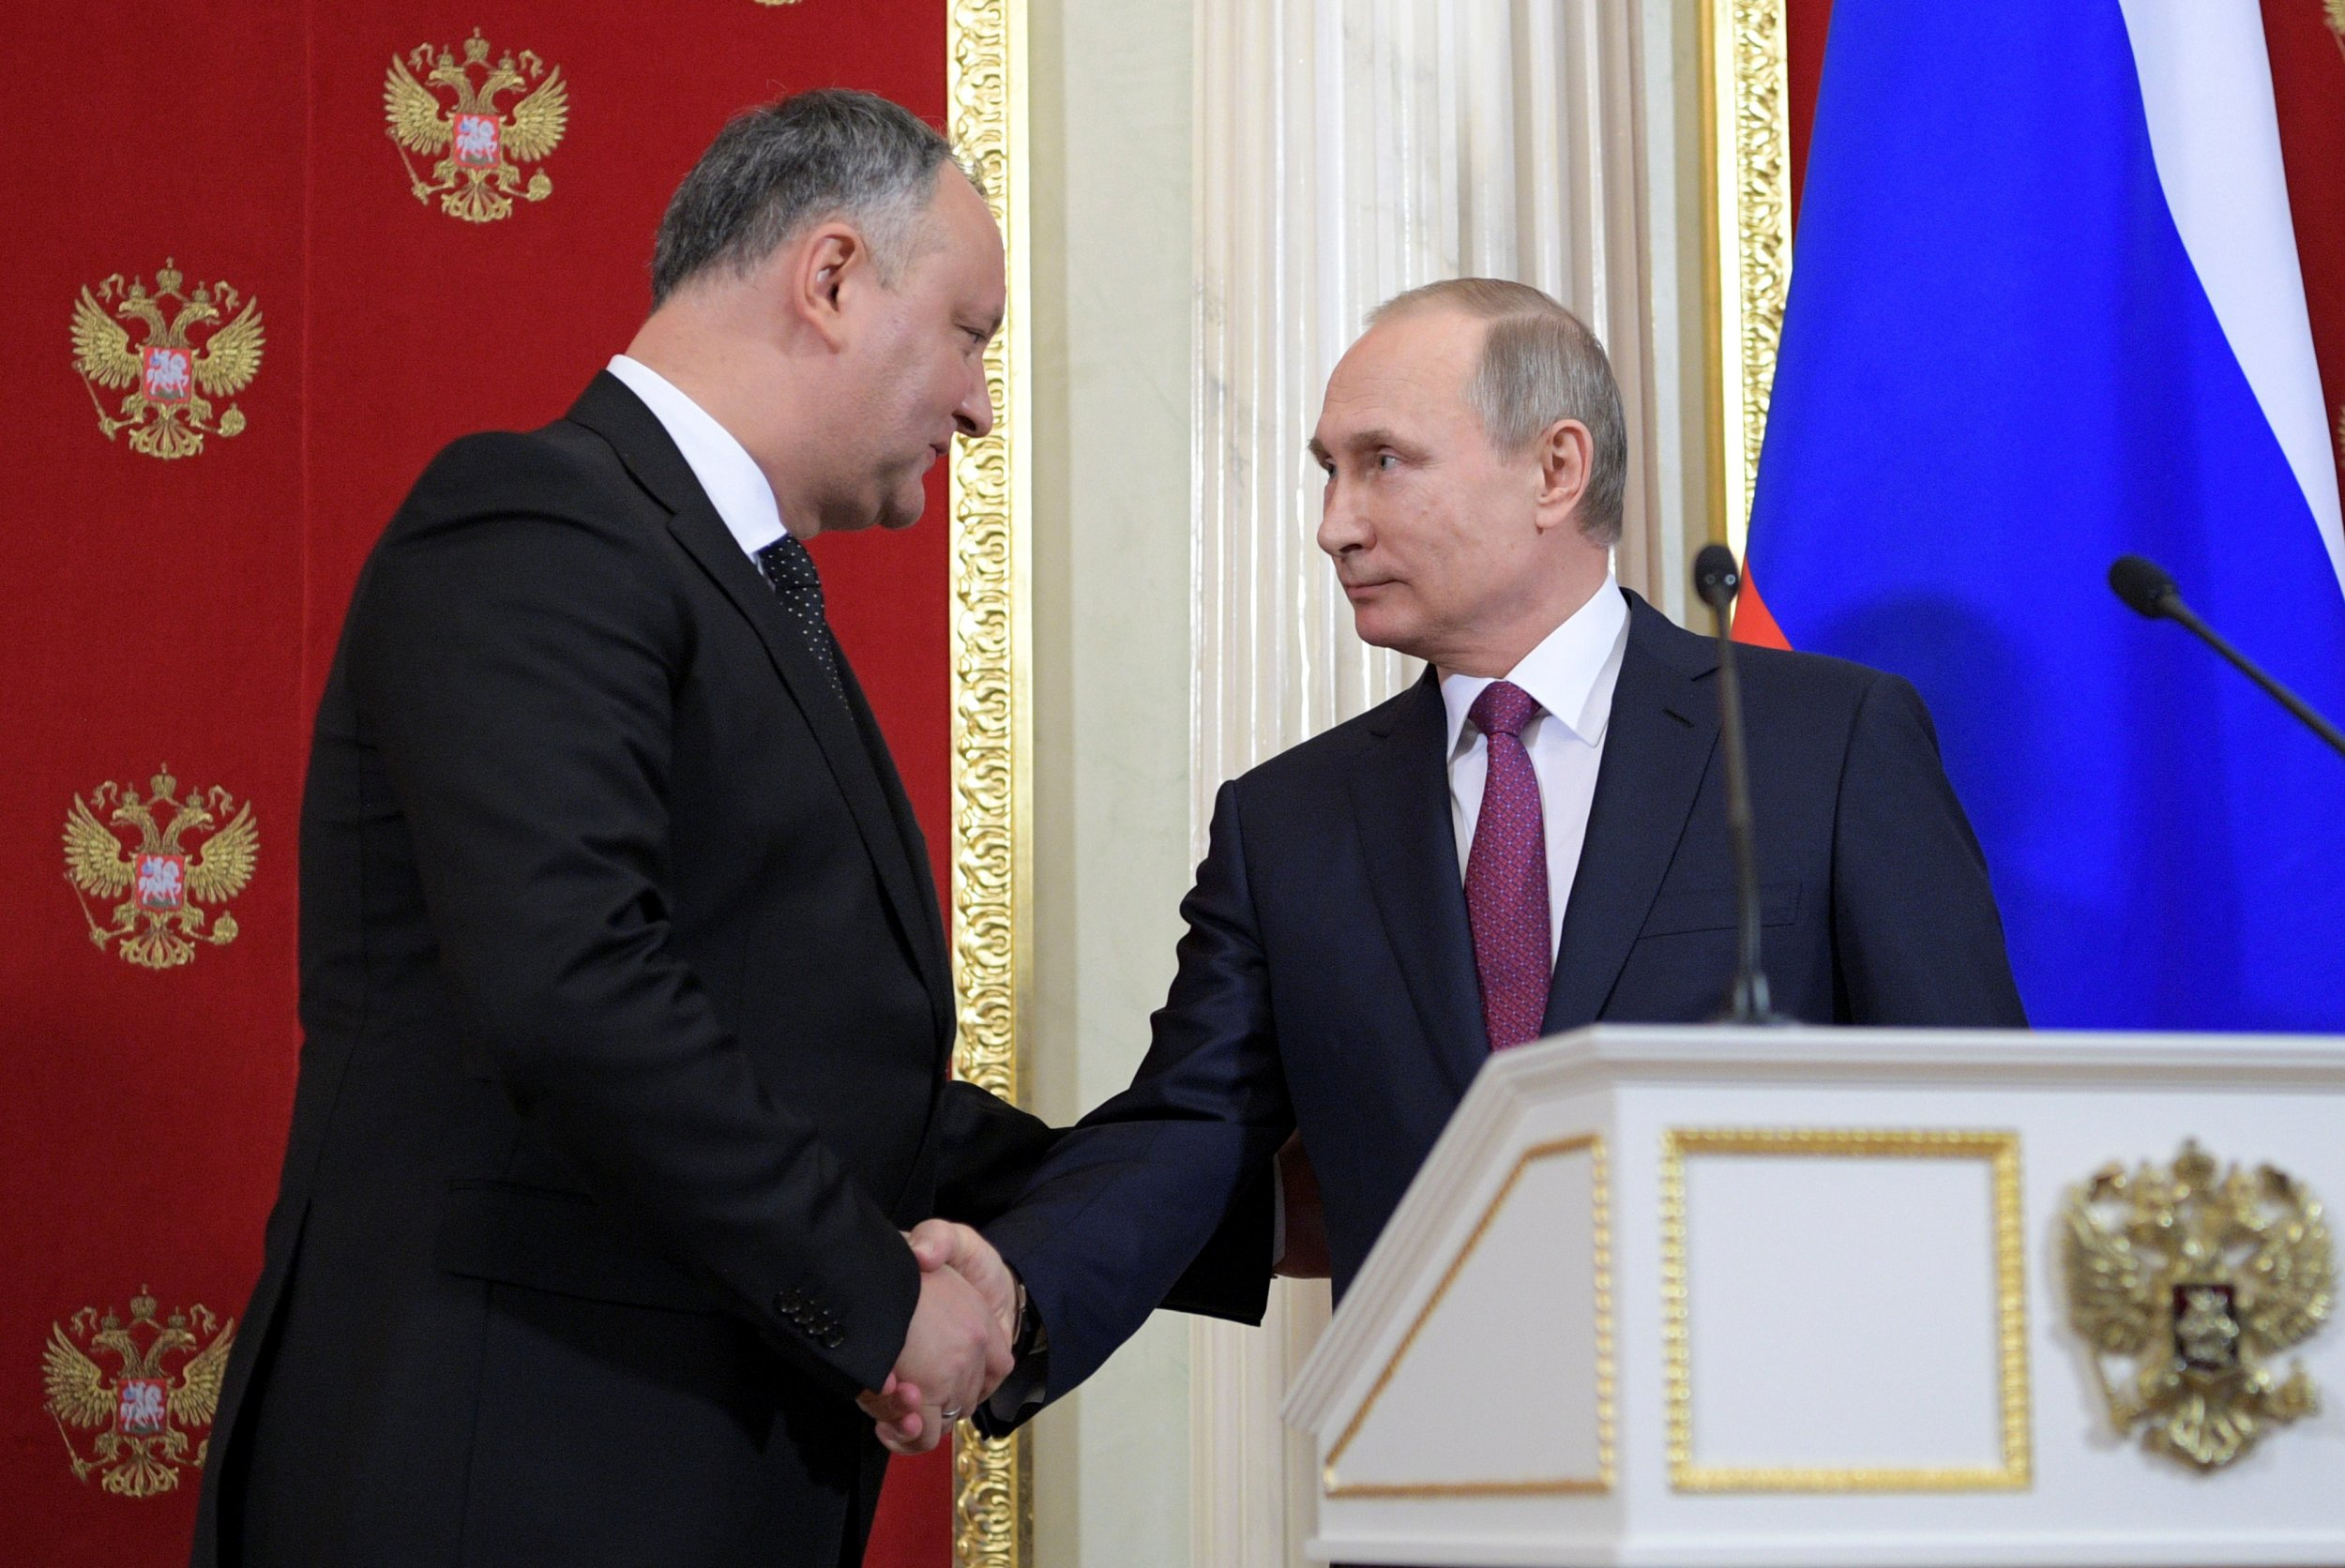 Dodon and Putin